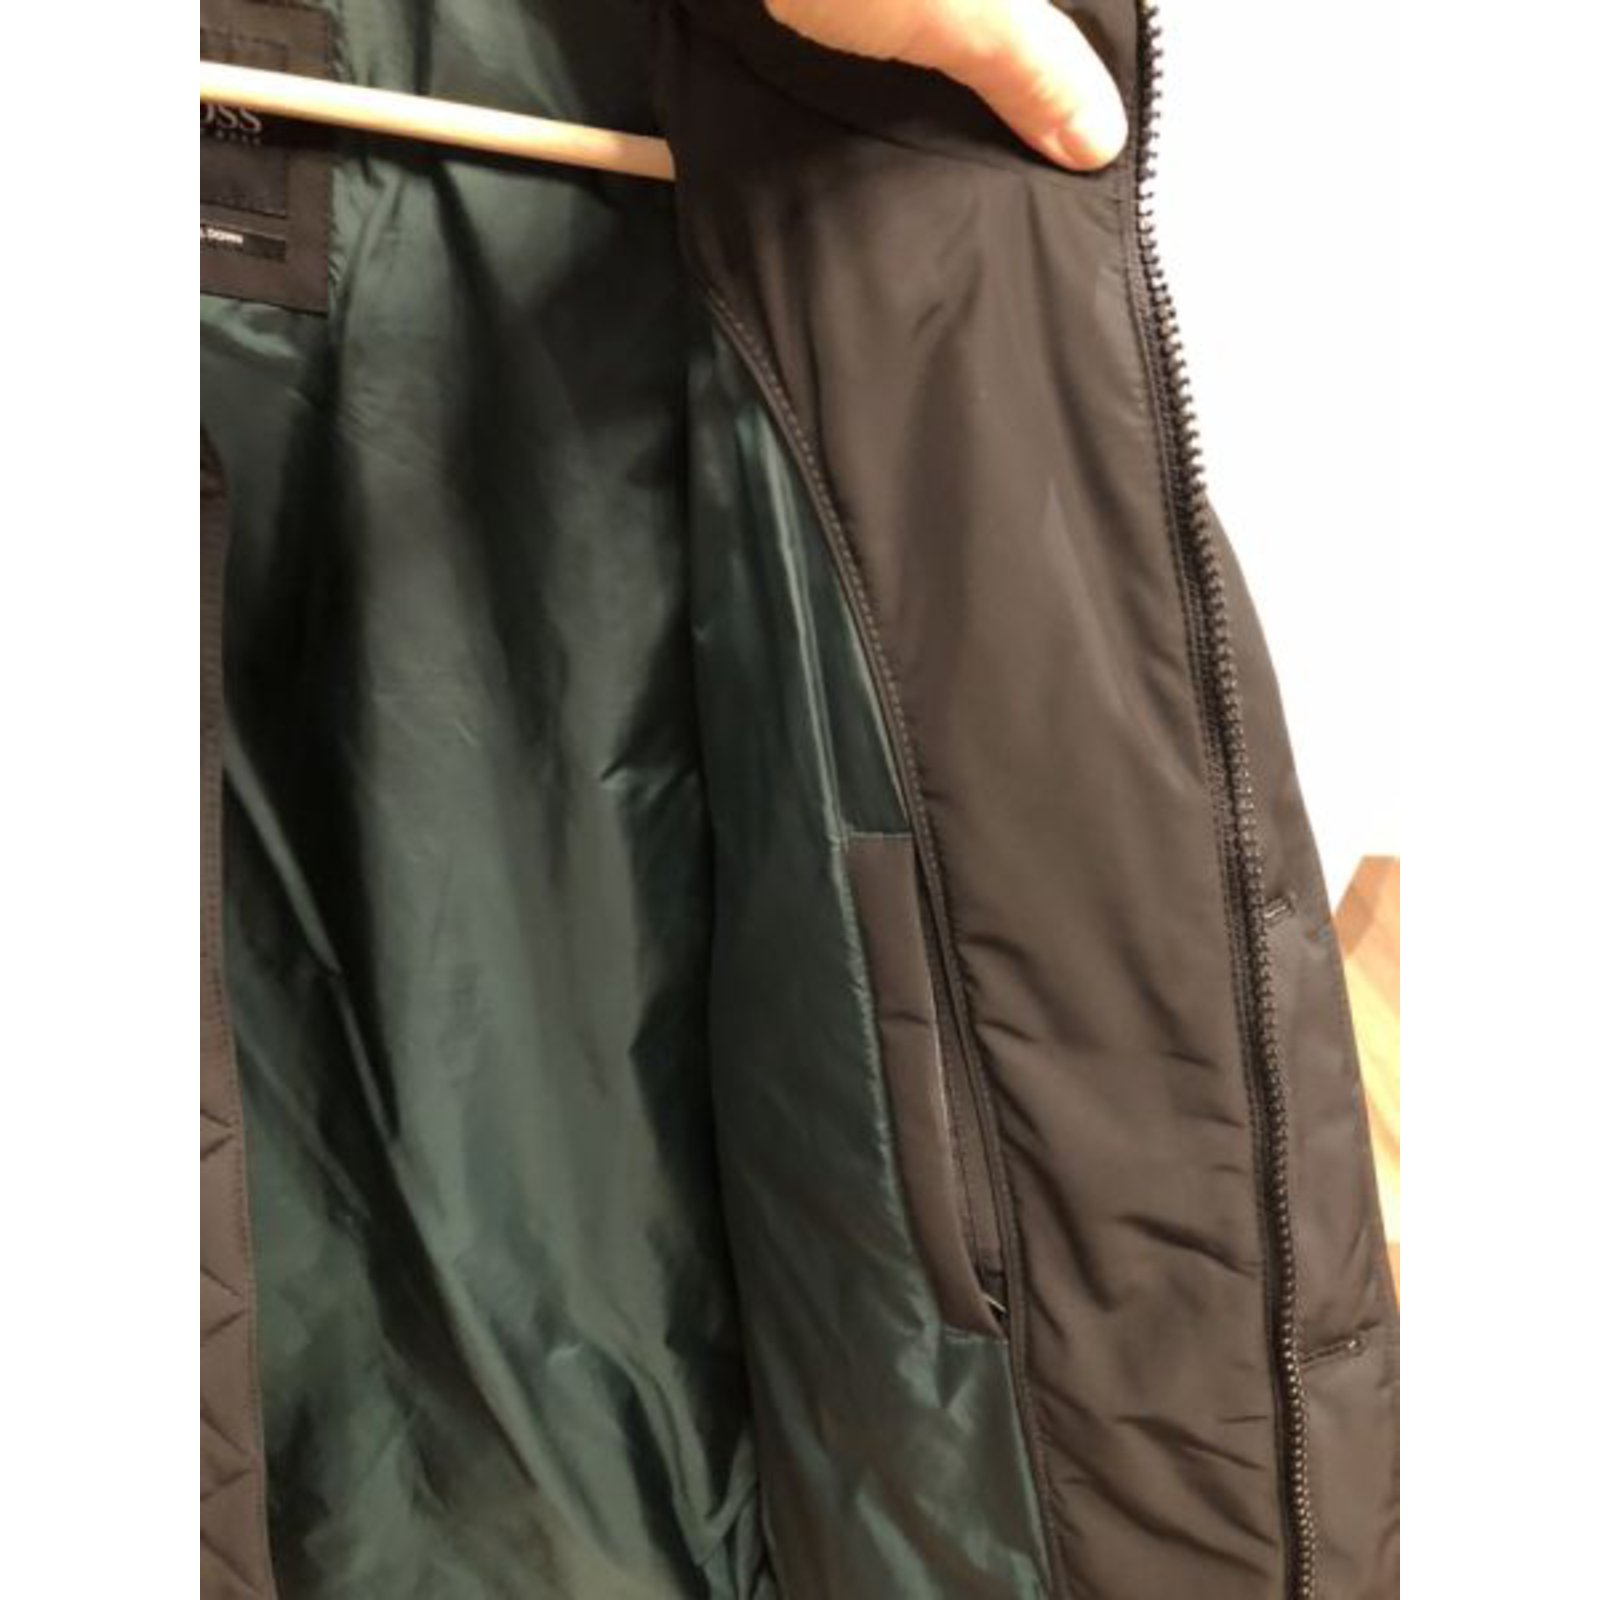 70bfbcd1 Hugo Boss Hugo Boss Down men's Jacket Men Coats Outerwear Cotton Black  ref.101402 - Joli Closet